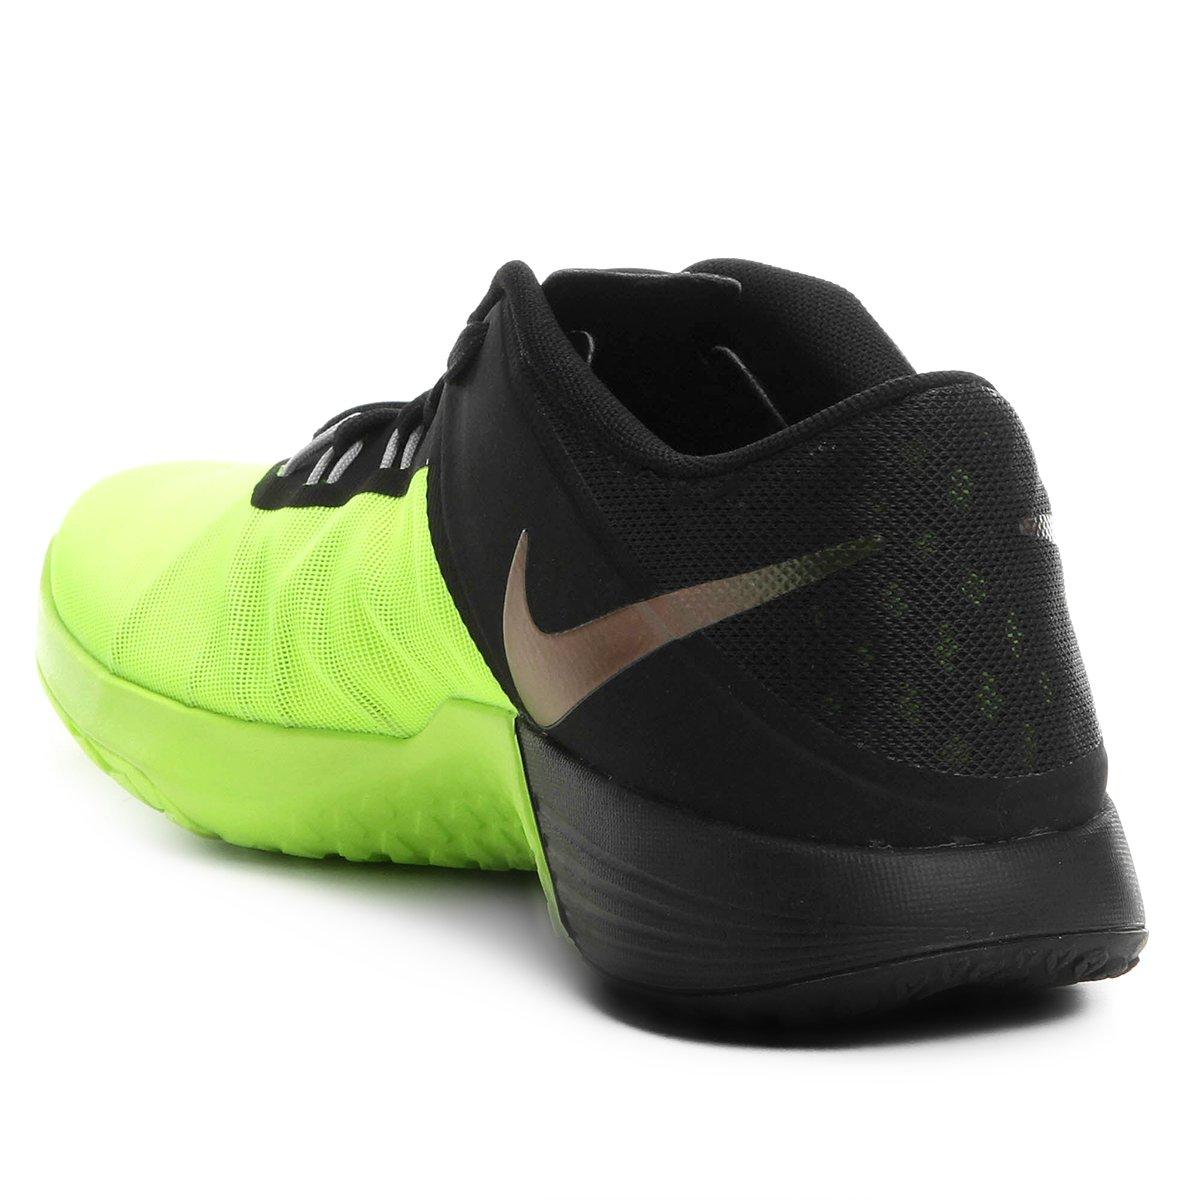 6df5d66b1b Tênis Nike Fs Lite Trainer 4 Masculino - Compre Agora